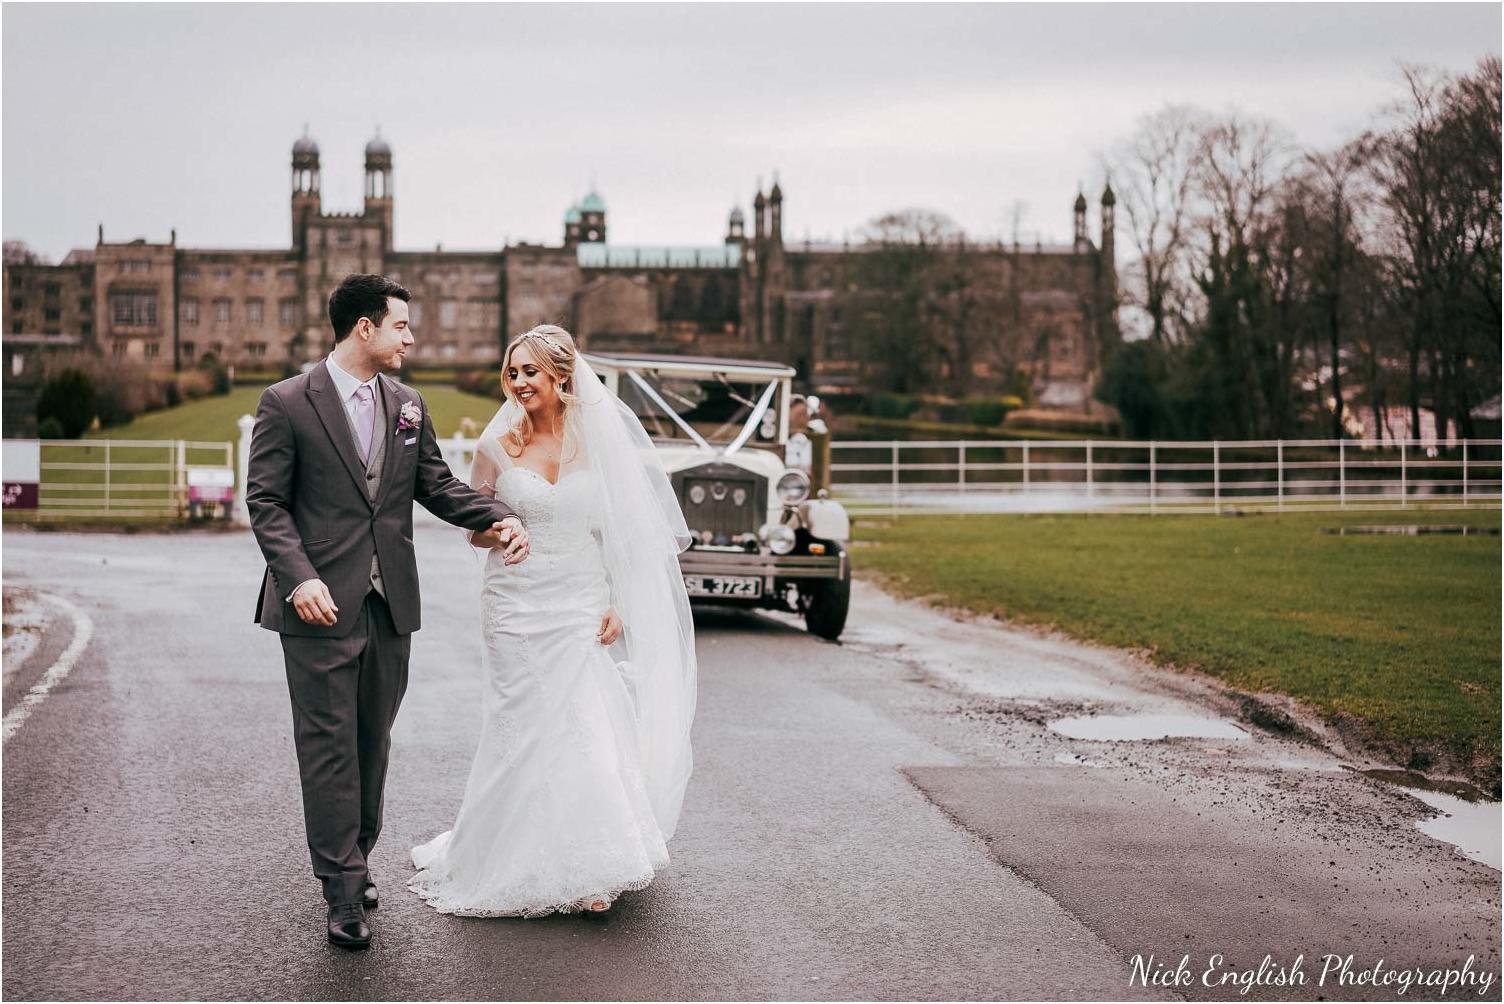 Mitton_Hall_Wedding_Photographer_2018-95.jpg